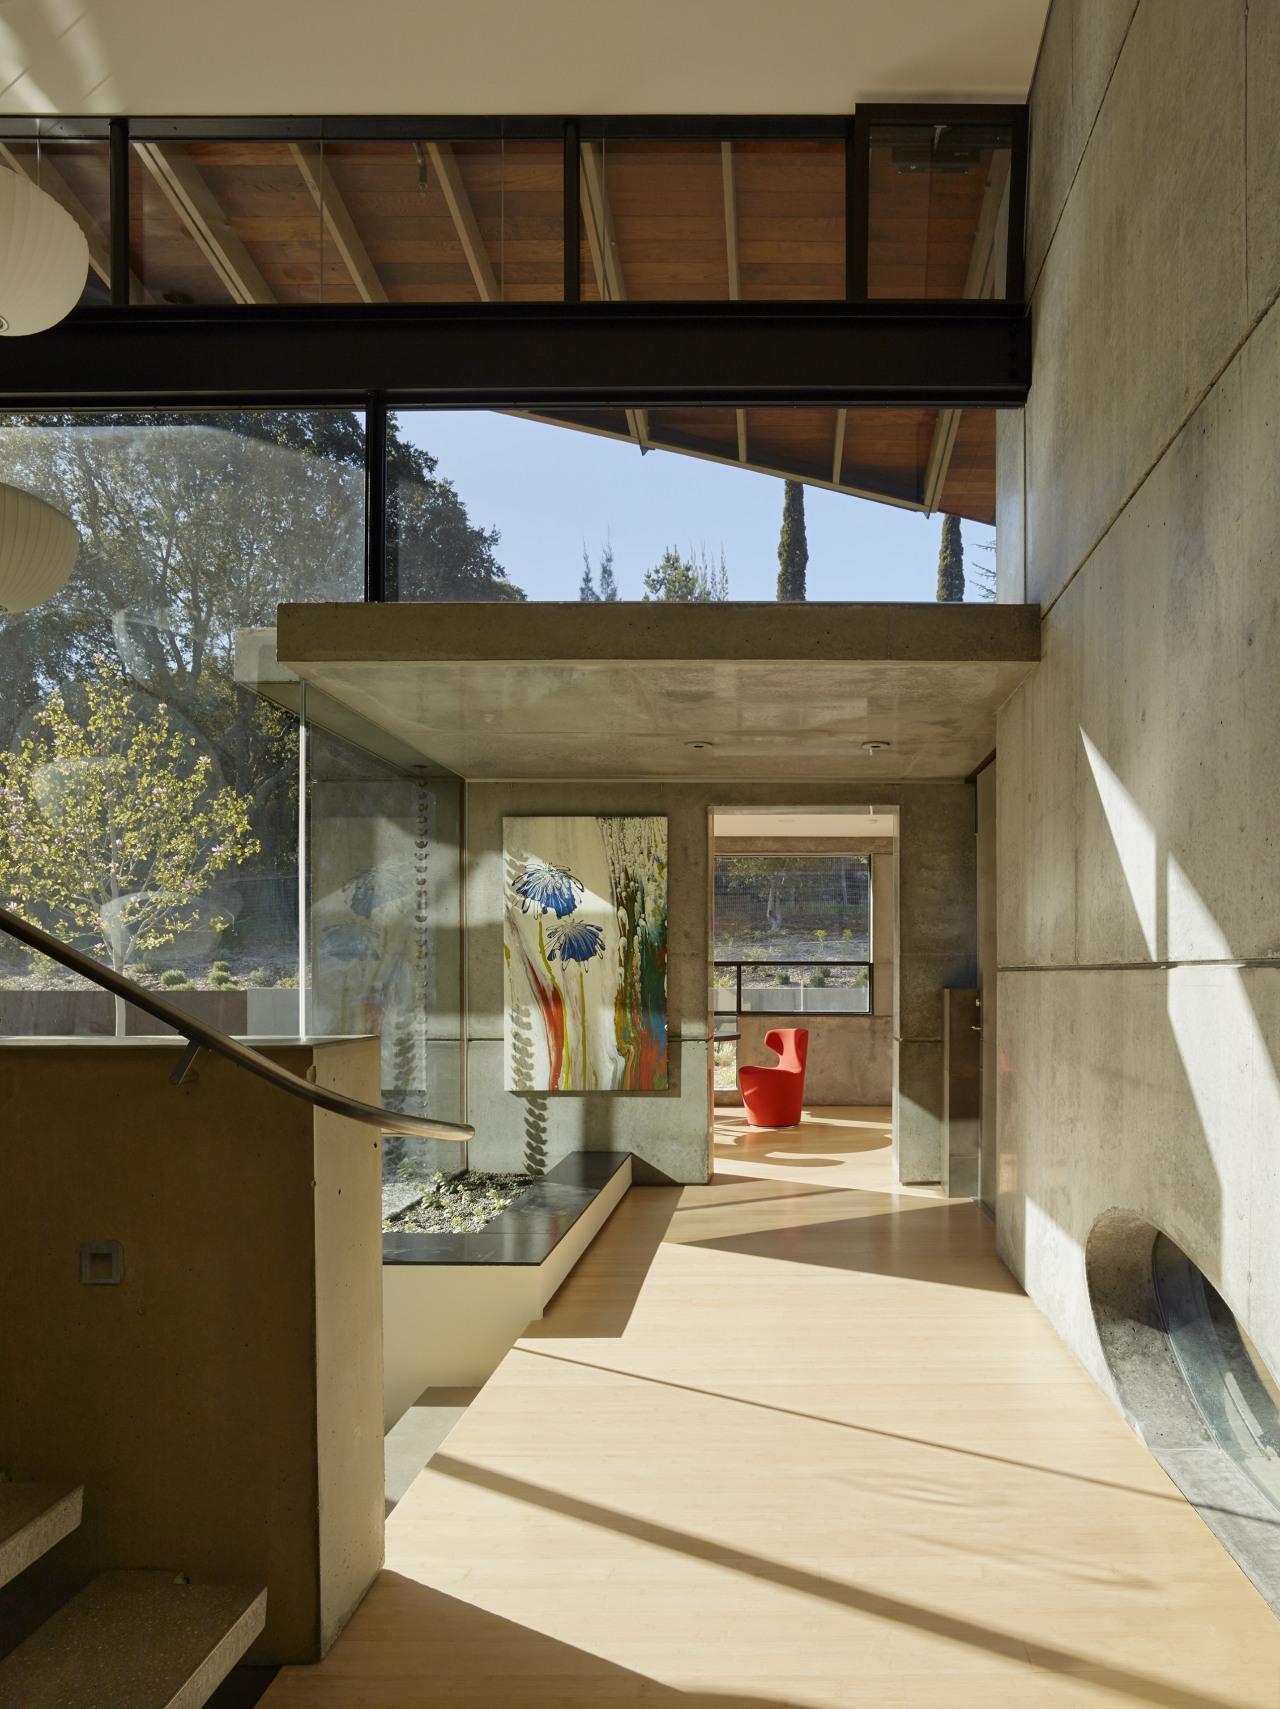 The 38cm-thick concrete walls in this home are architecture, house, home, interior design, heat retention, concrete, entranceway, heating, cooling, FuTung Chen,  Chen Design